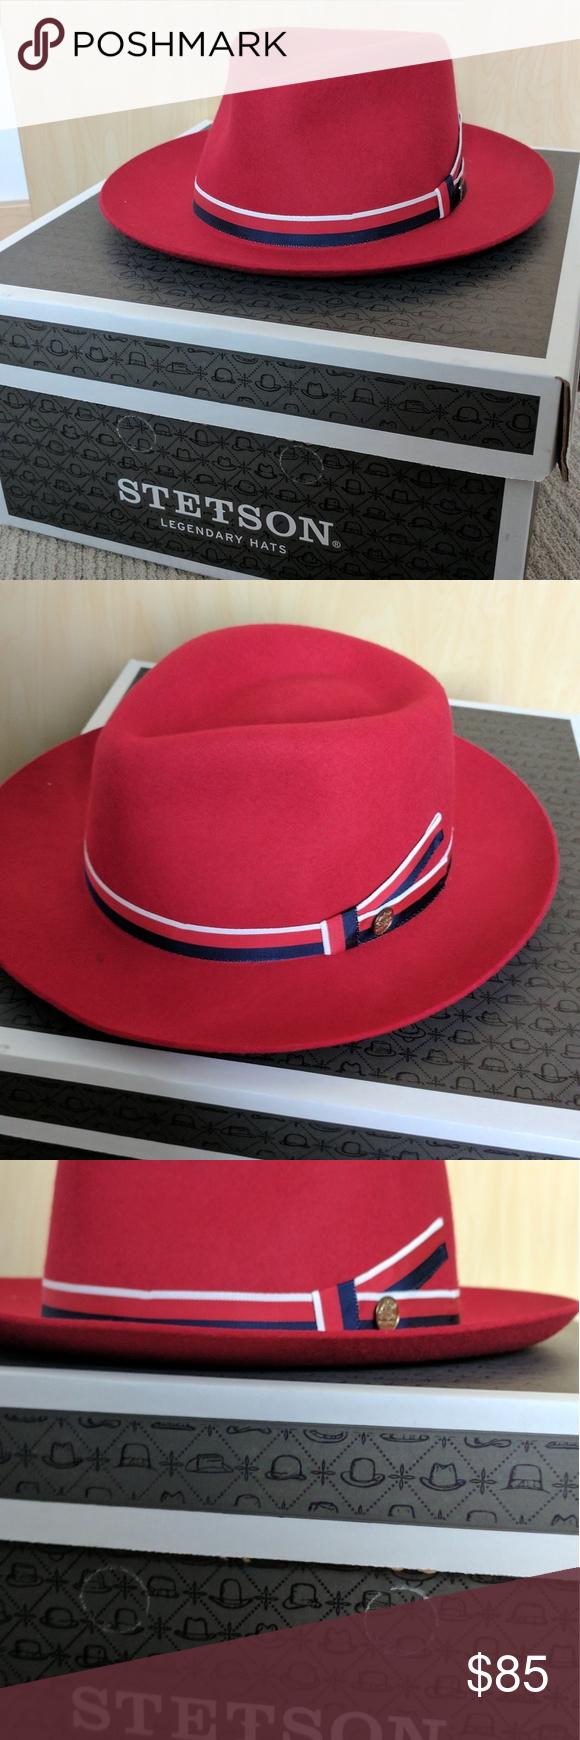 107f80ca Stetson Aviatrix (Agent Carter) hat. NWOT IN BOX Red, Stetson Aviatrix, as  seen on Agent Carter. NWOT,in Stetson box, size: Large Stetson Accessories  Hats